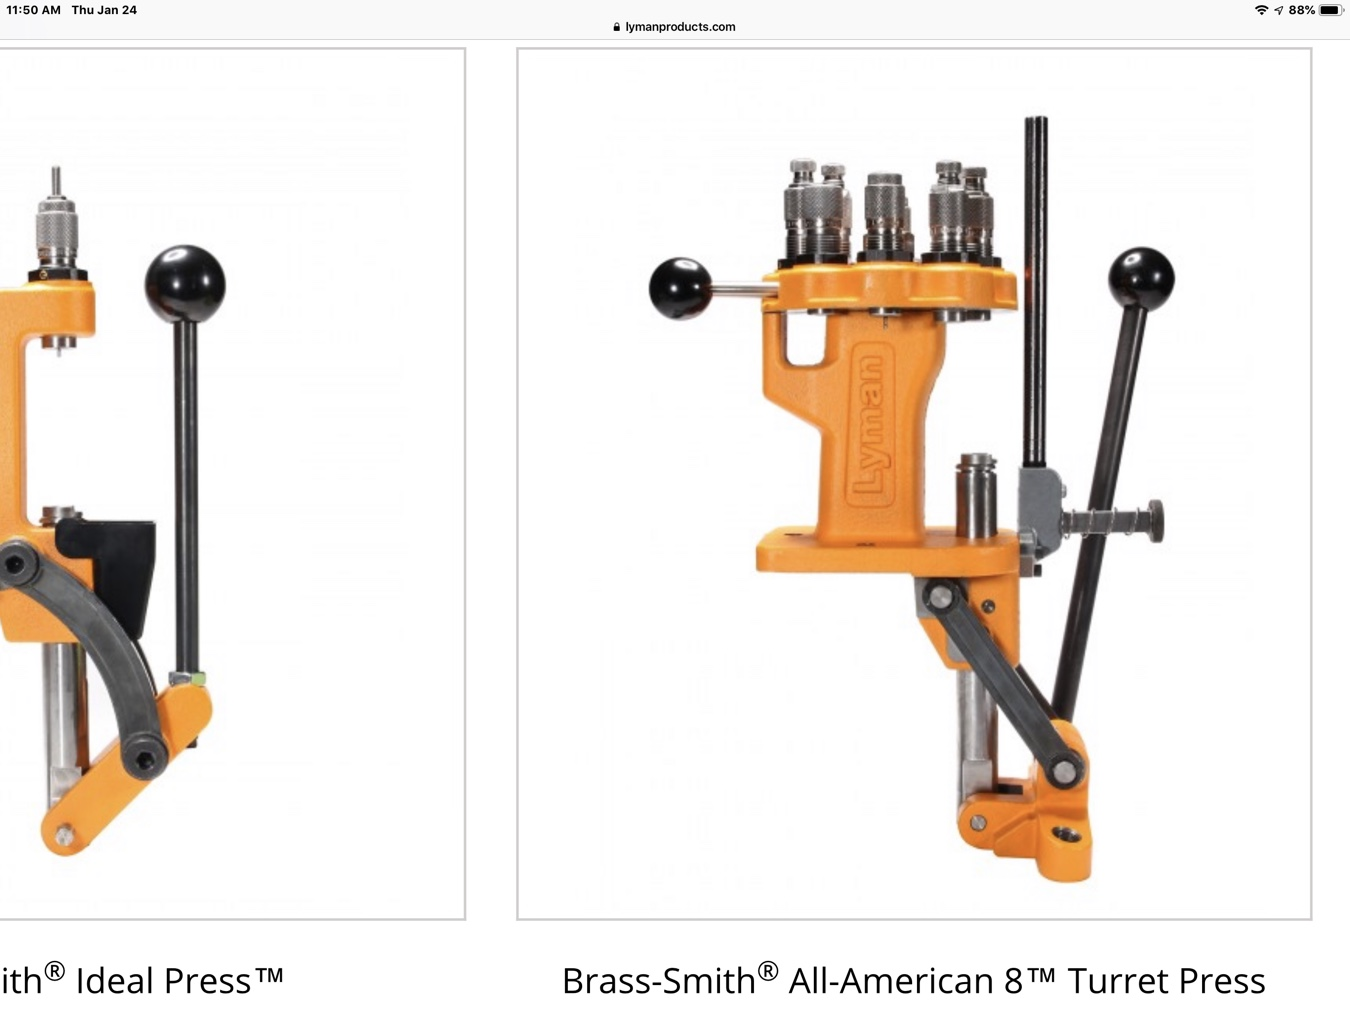 Redding T7 vs Lyman All American turret press